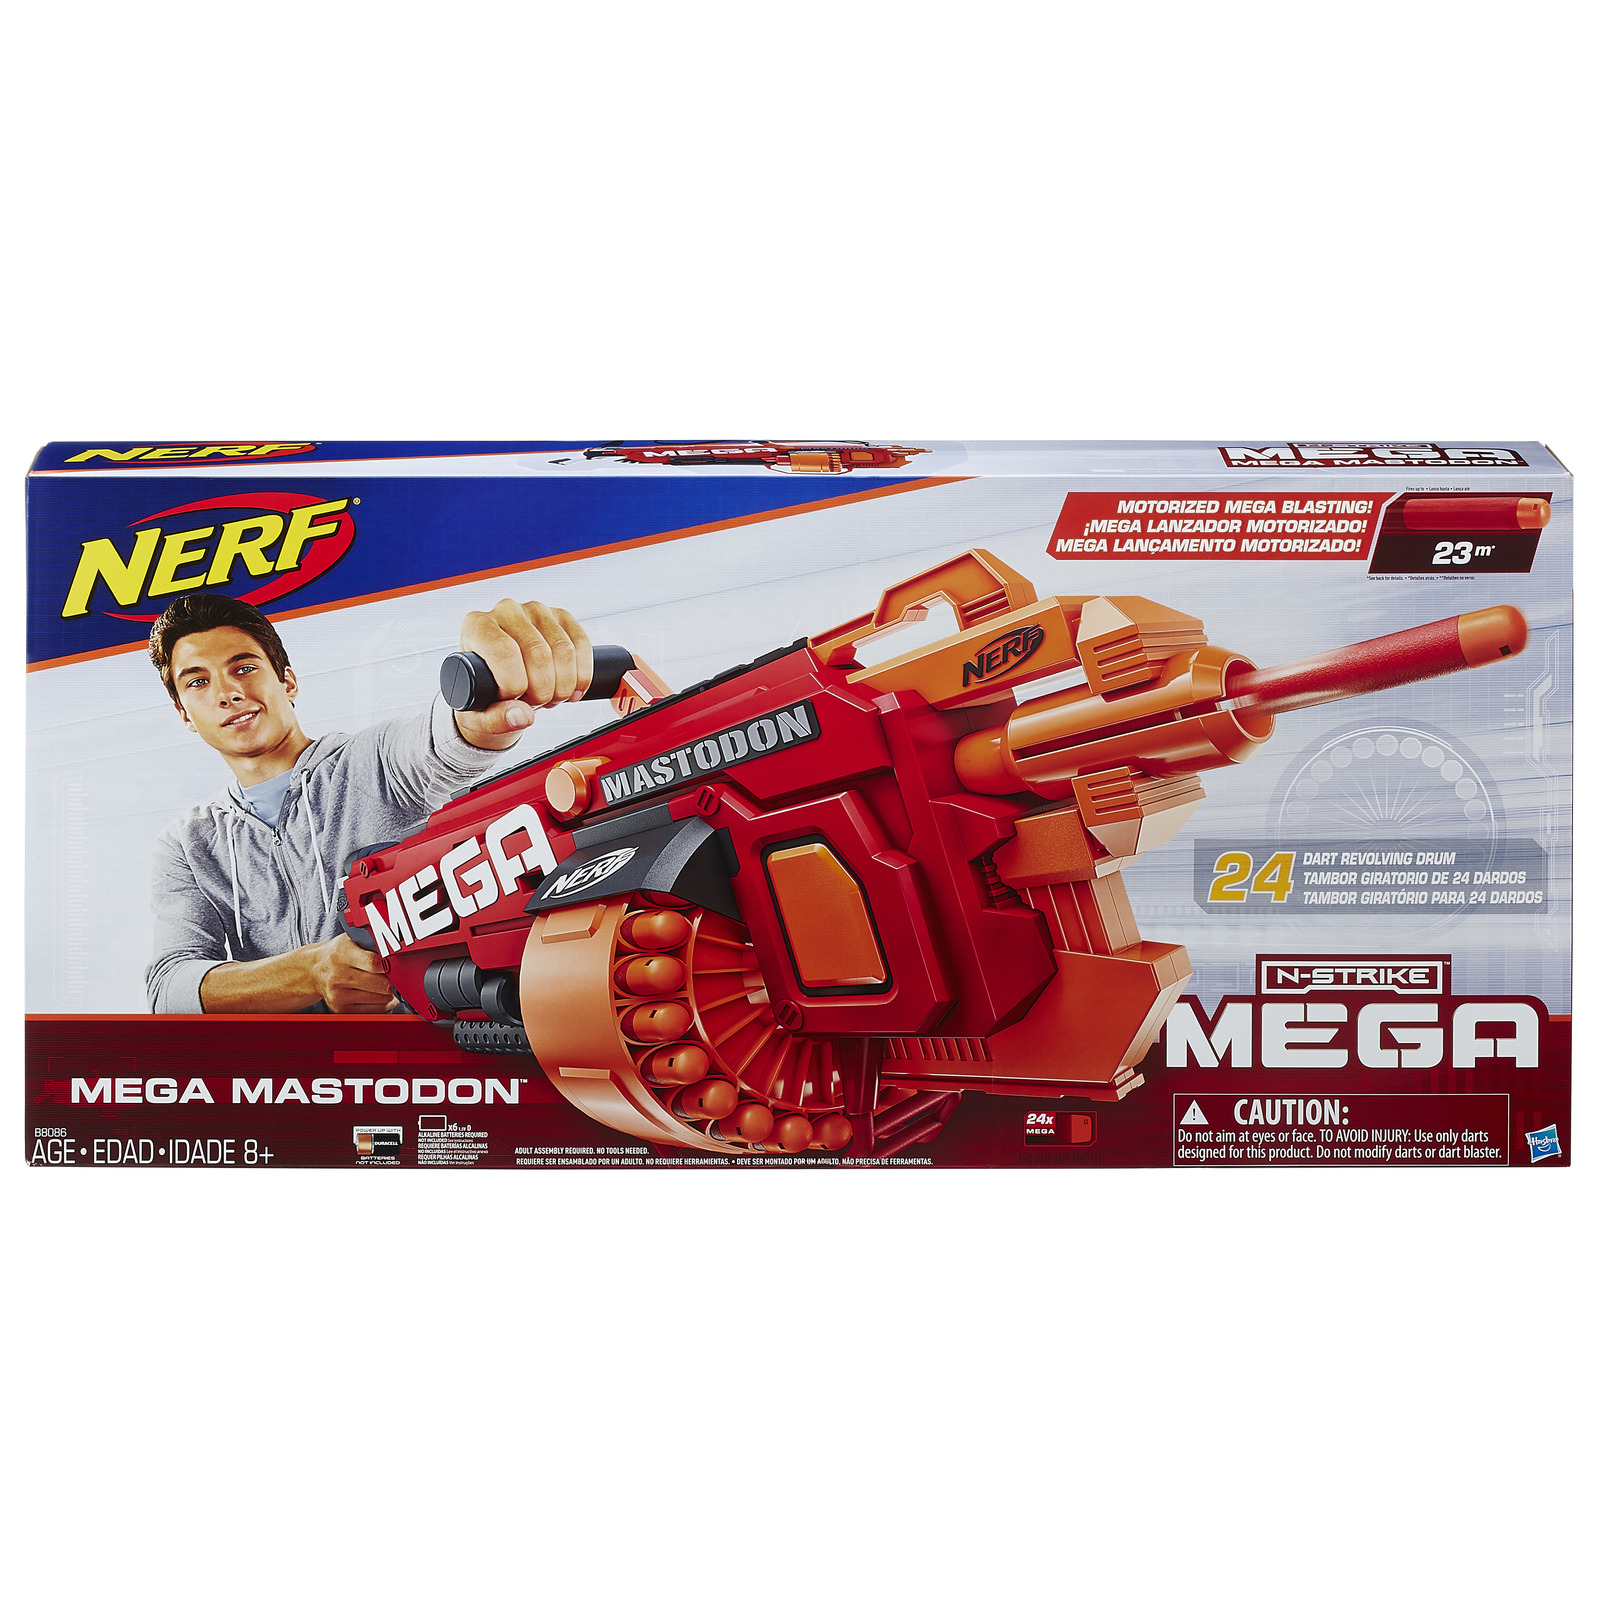 Nerf N-Strike Mega Mastodon image